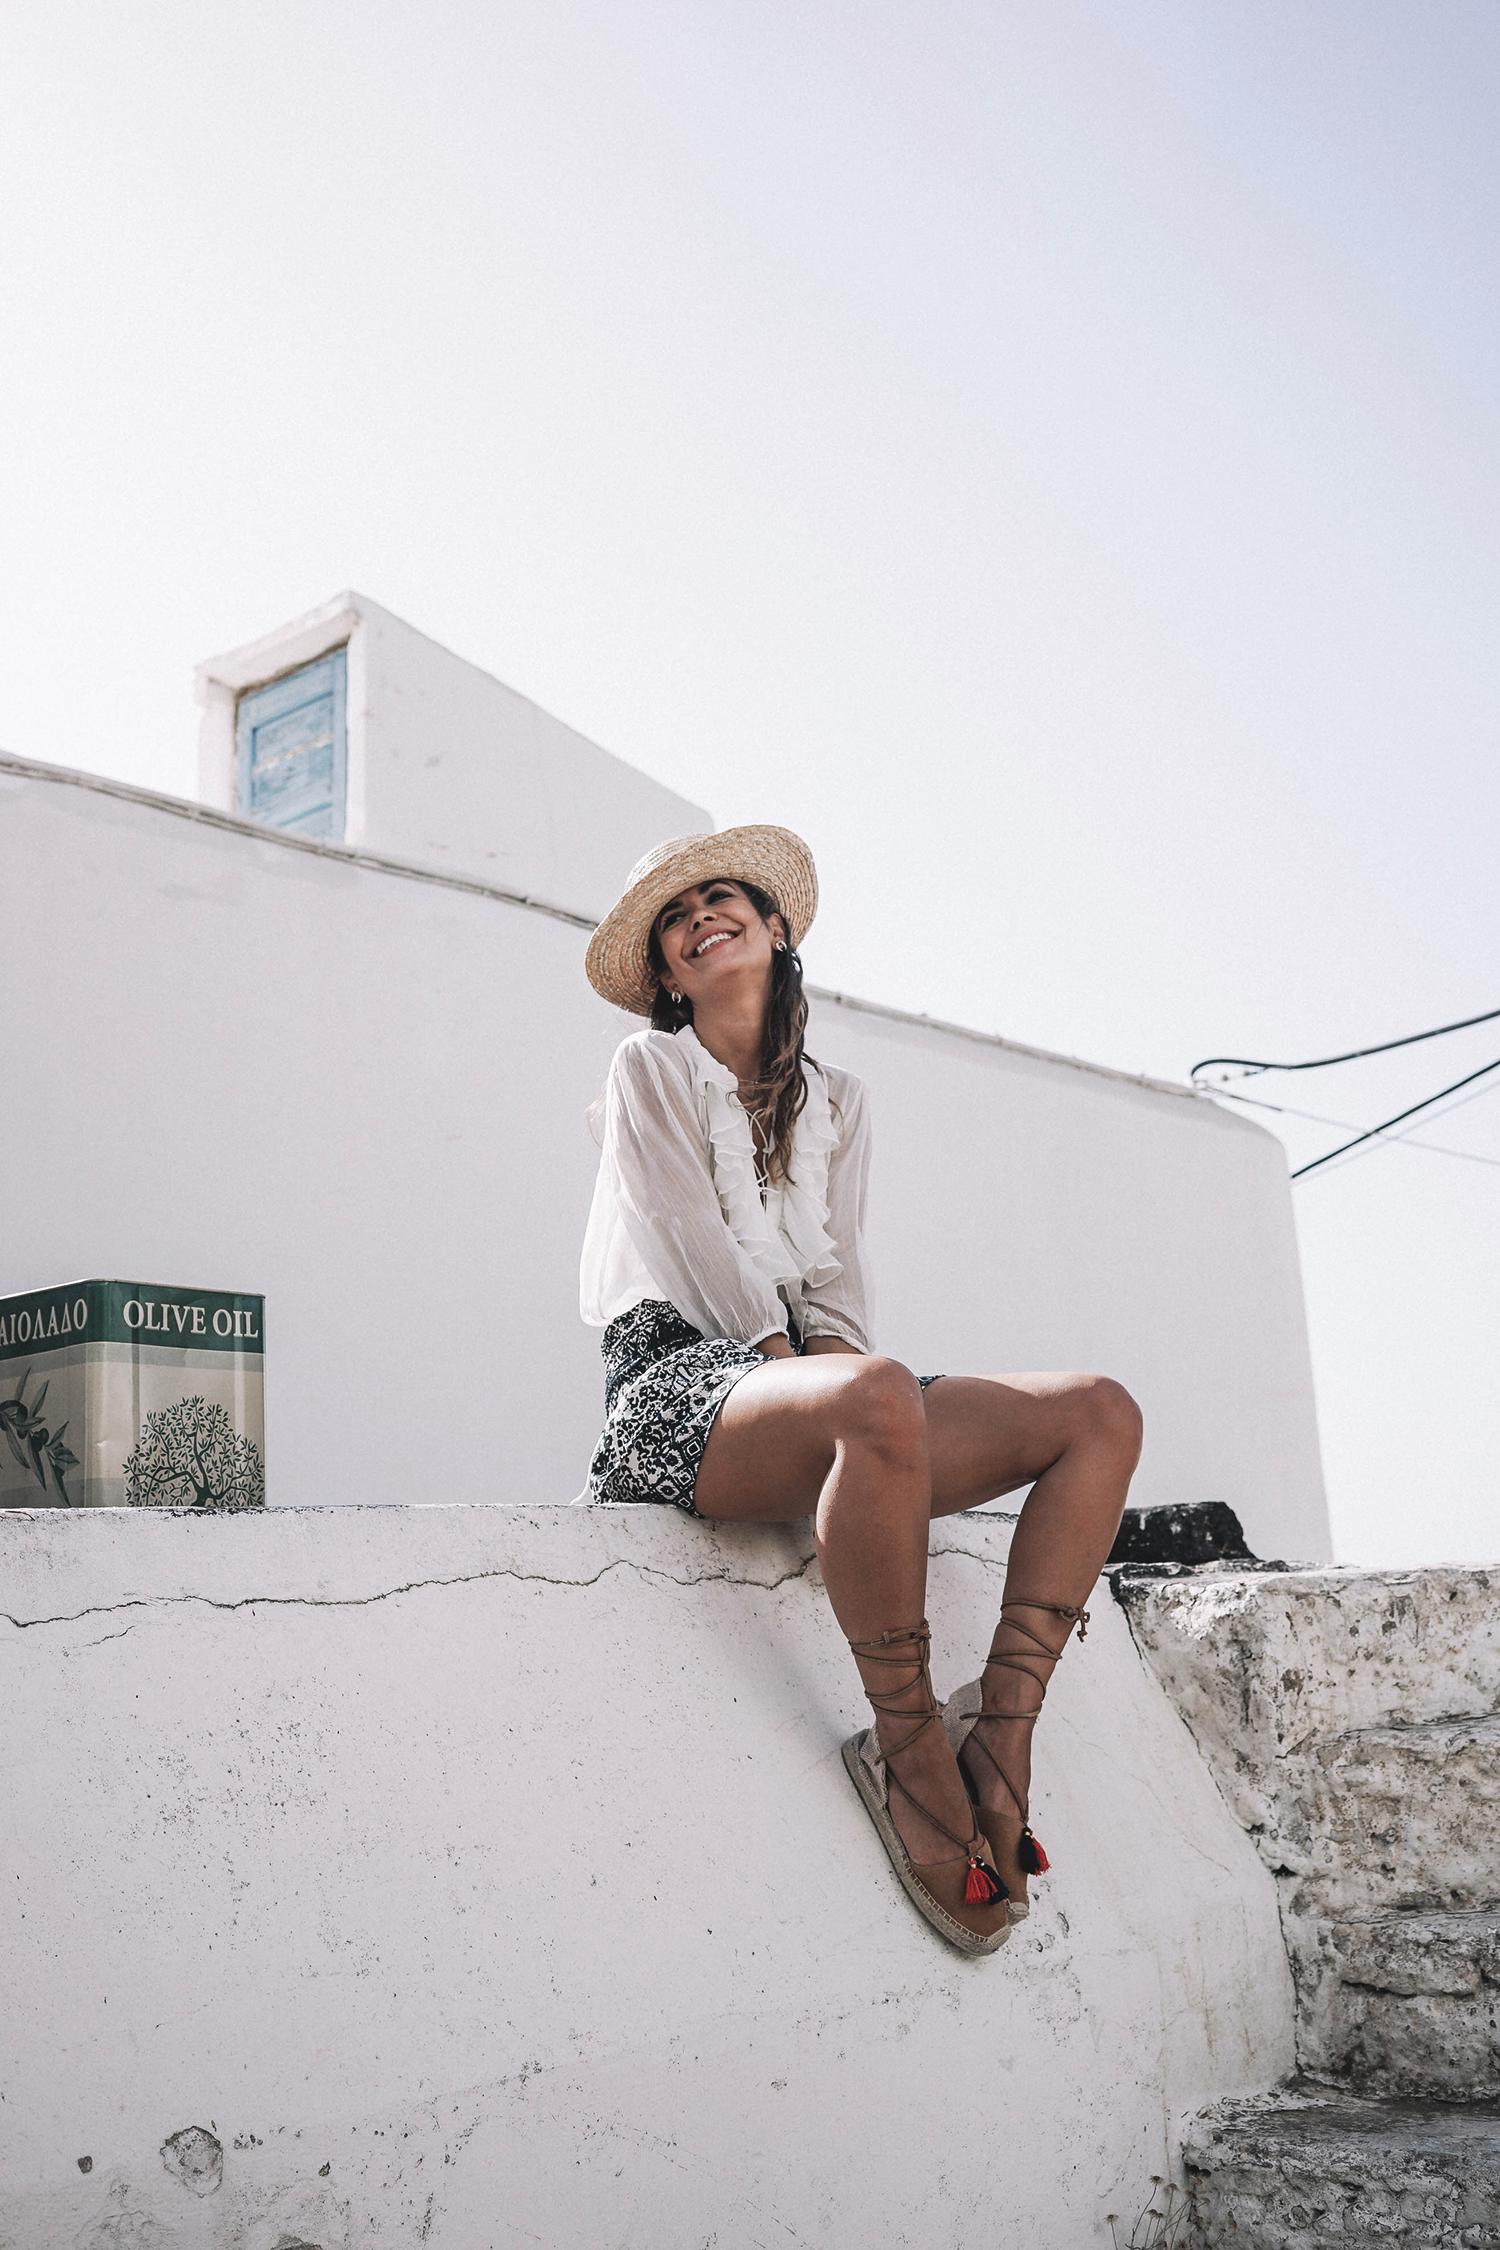 Lace_up_Blouse-Ralph_Lauren-Soludos_Espadrilles-Soludos_Escapes-Skirt-Straw_Hat-Canotier-Lack_Of_Color-Street_Style-Mykonos-Greece-Collage_Vintage-133